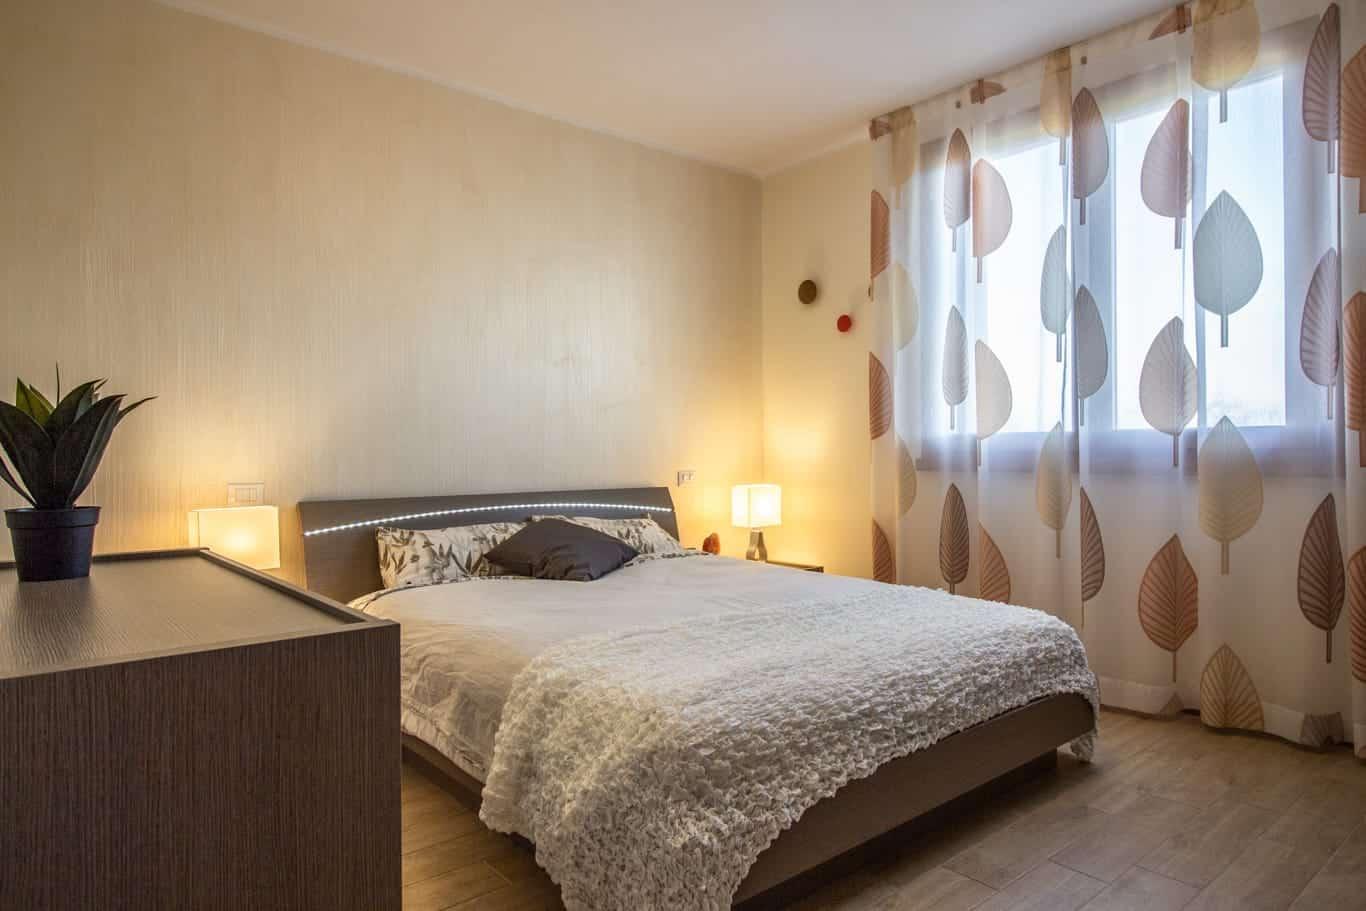 Appartamento_cimpello (5 of 8)